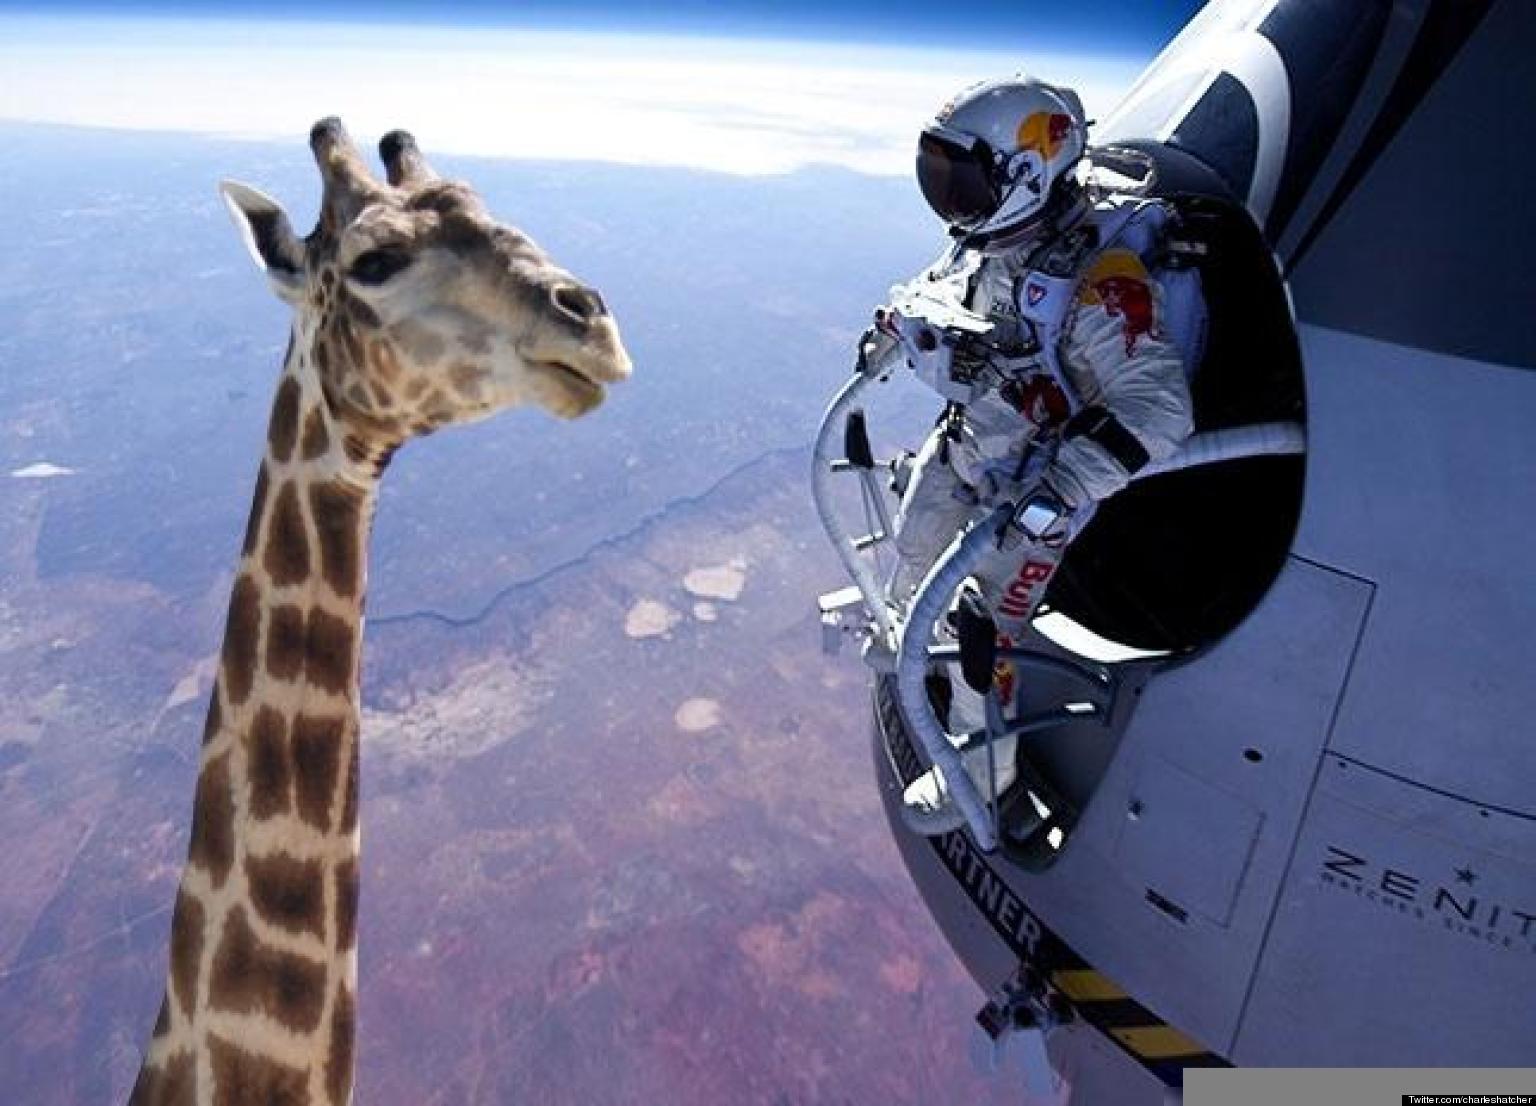 Felix Baumgartner's Space Jump: The Best Photoshop Funnies (PICS) | HuffPost UK